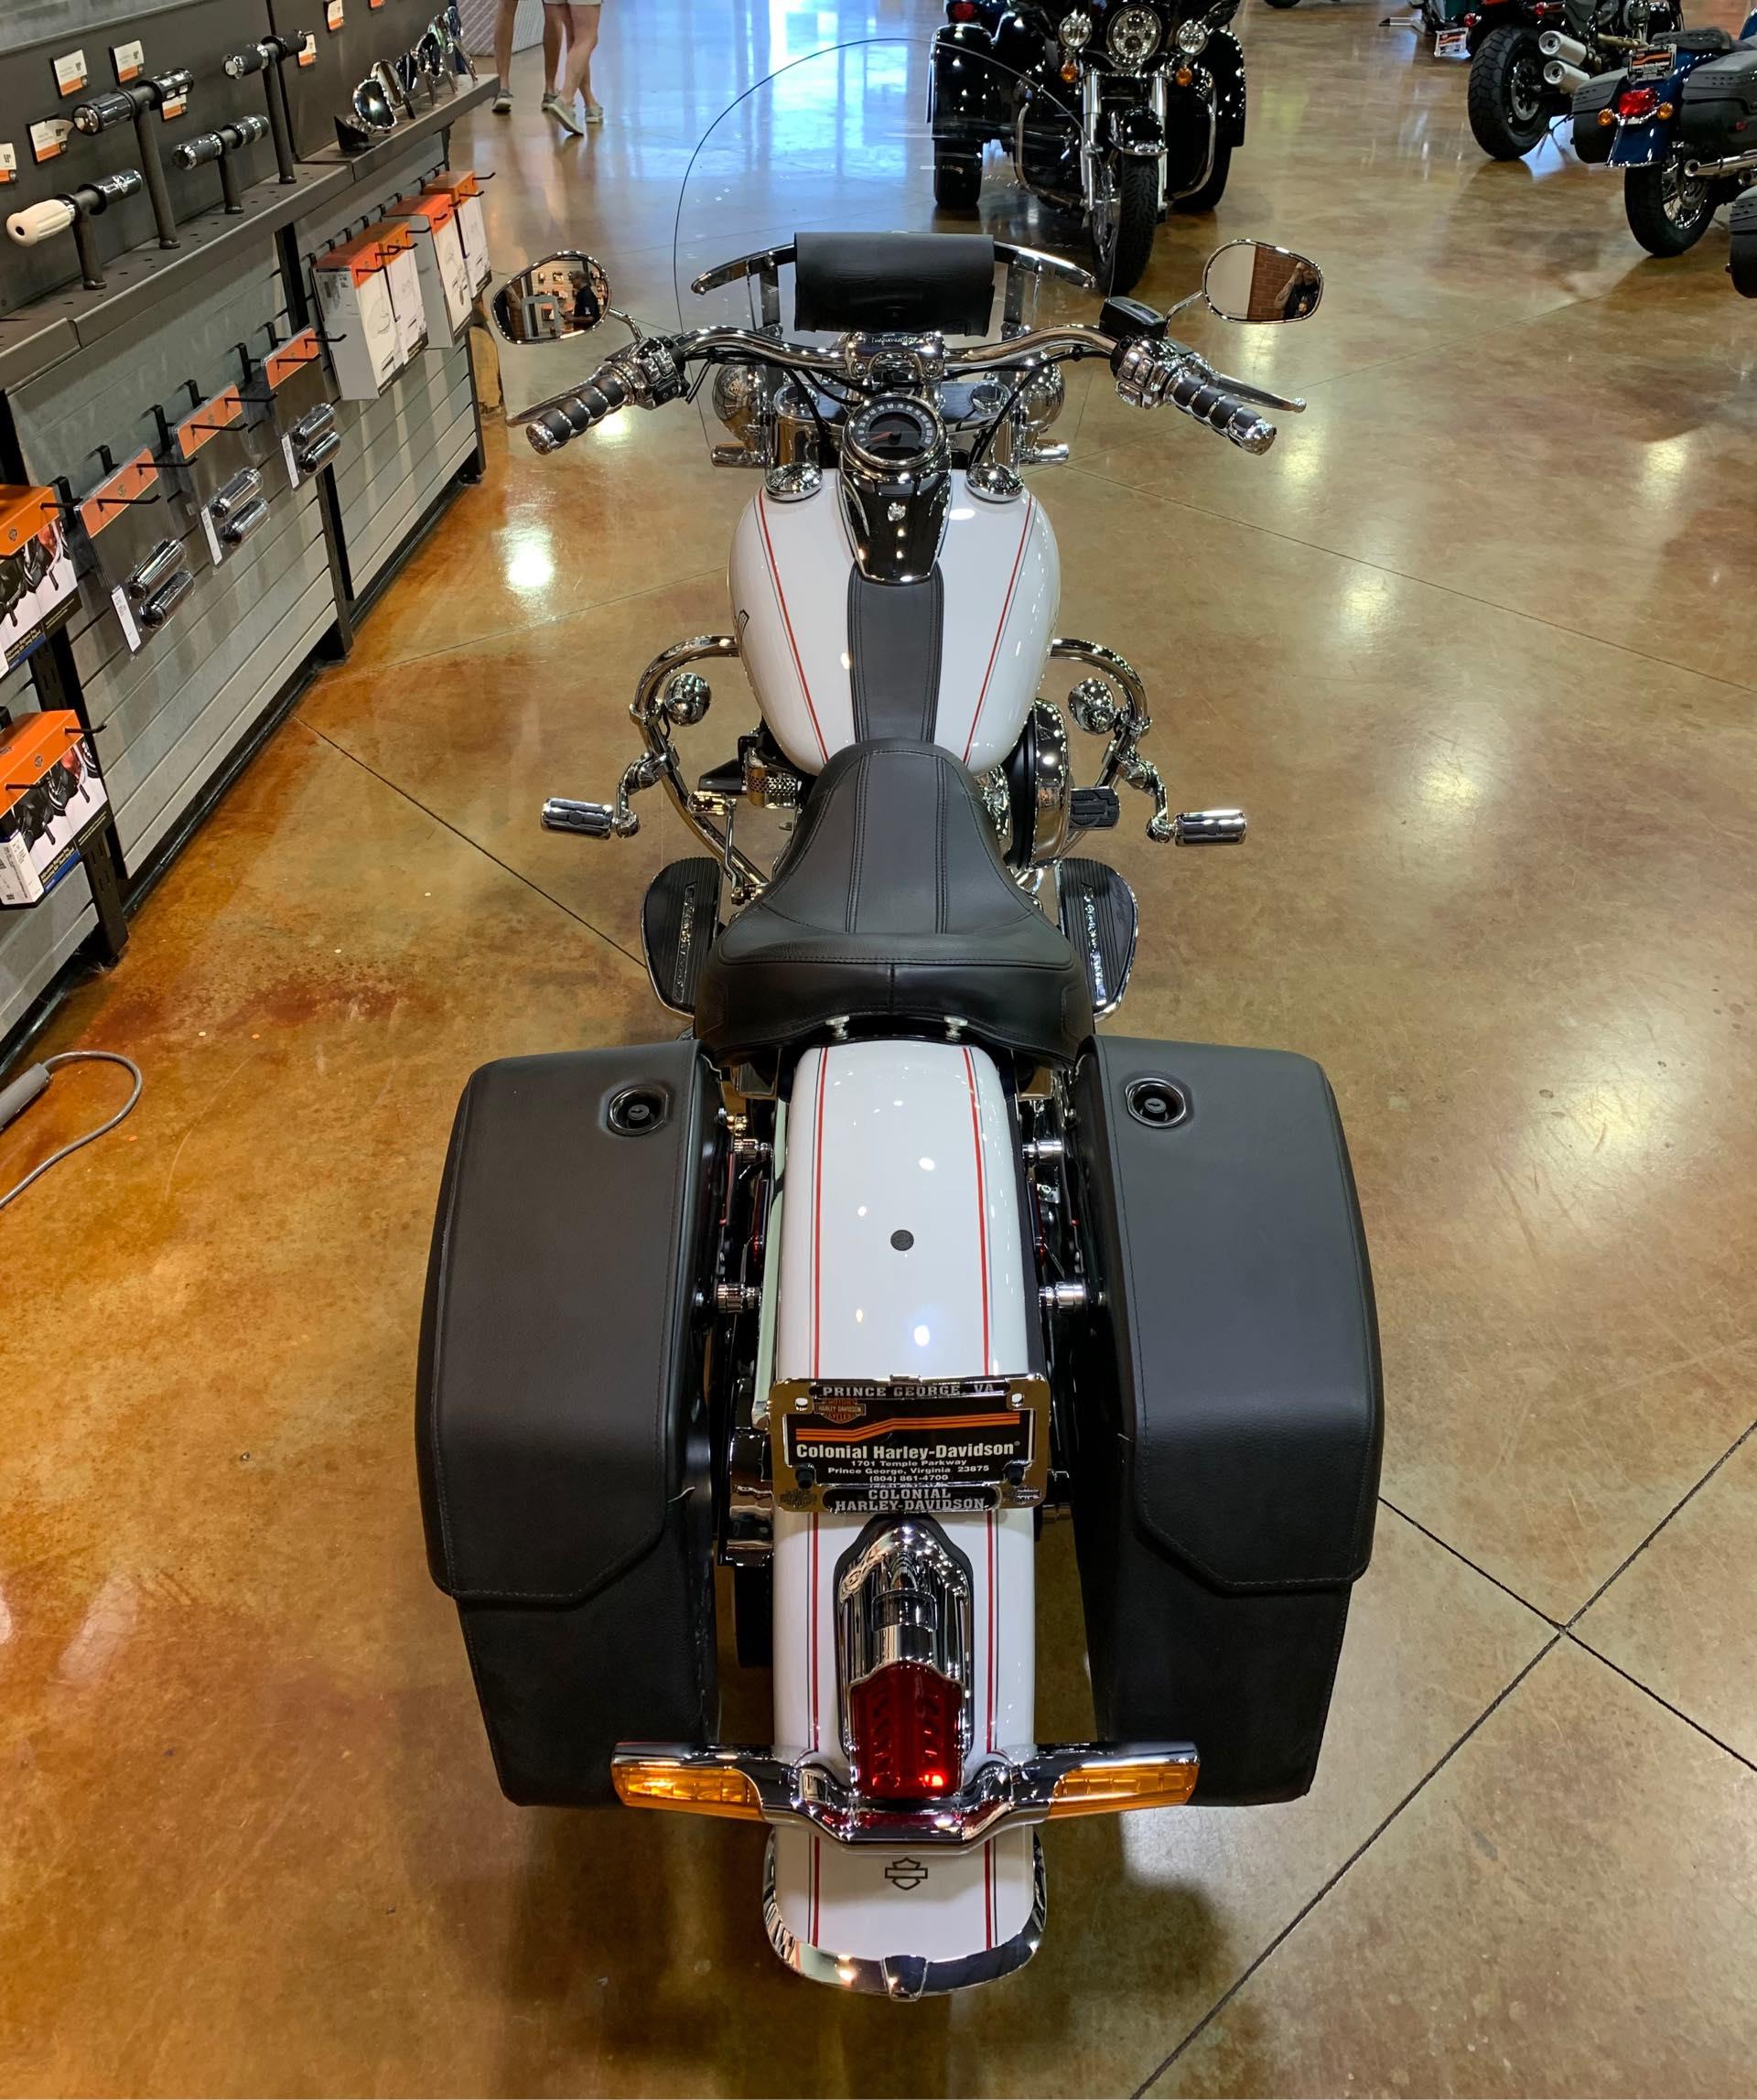 2020 Harley-Davidson Softail Deluxe at Colonial Harley-Davidson